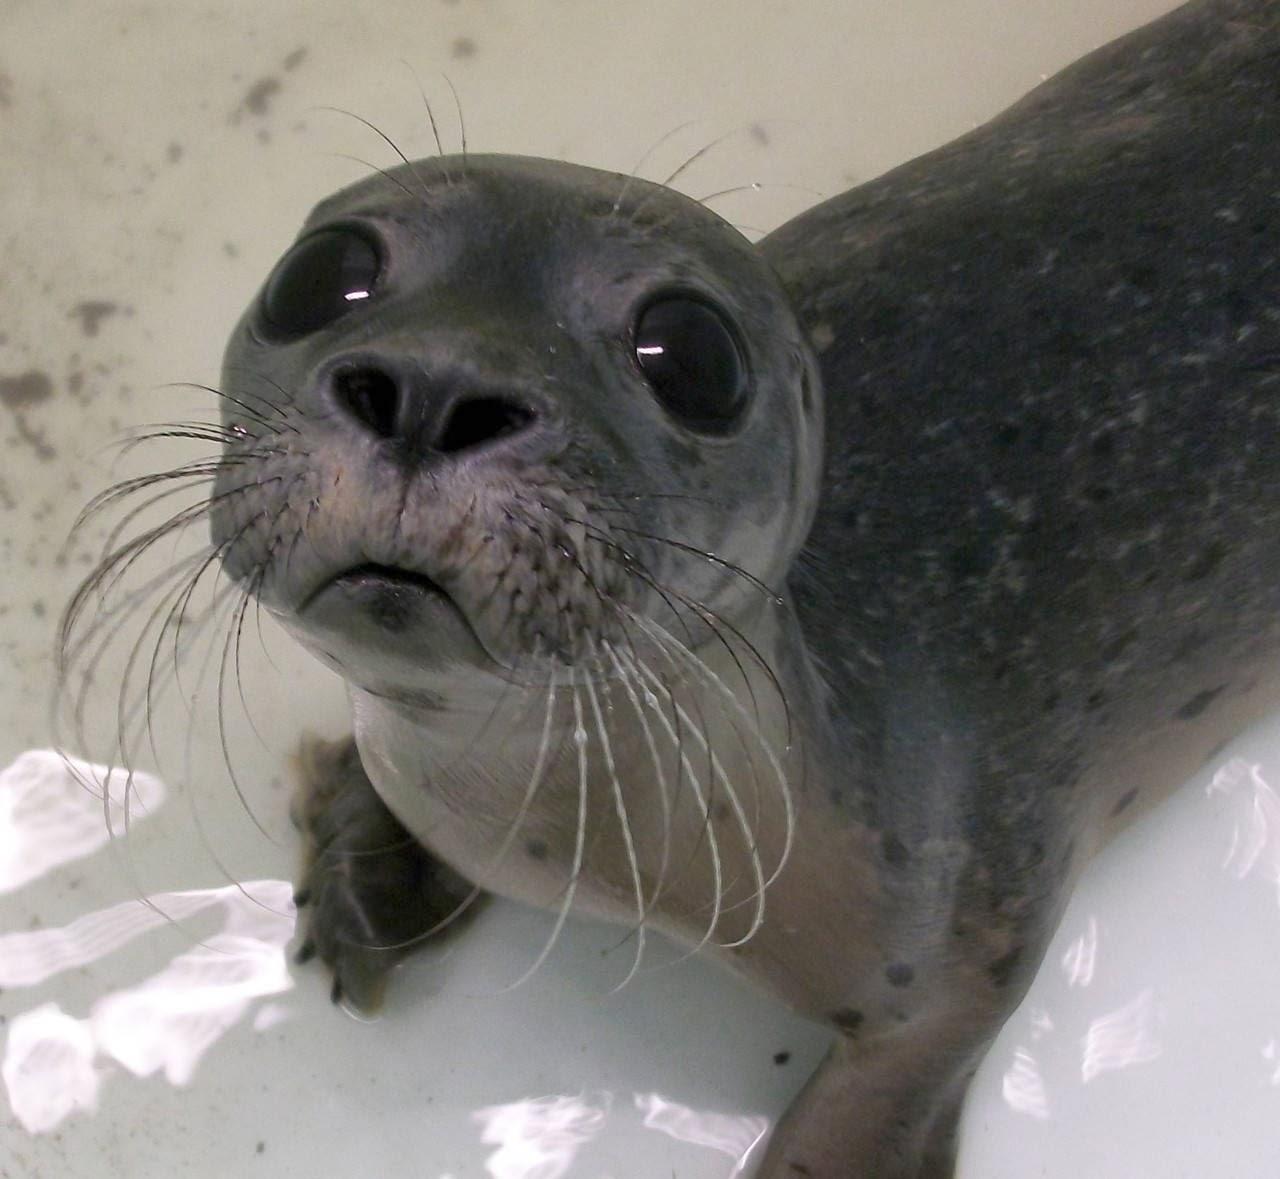 Funny animals of the week - 14 February 2014 (40 pics), seal cub looks sad